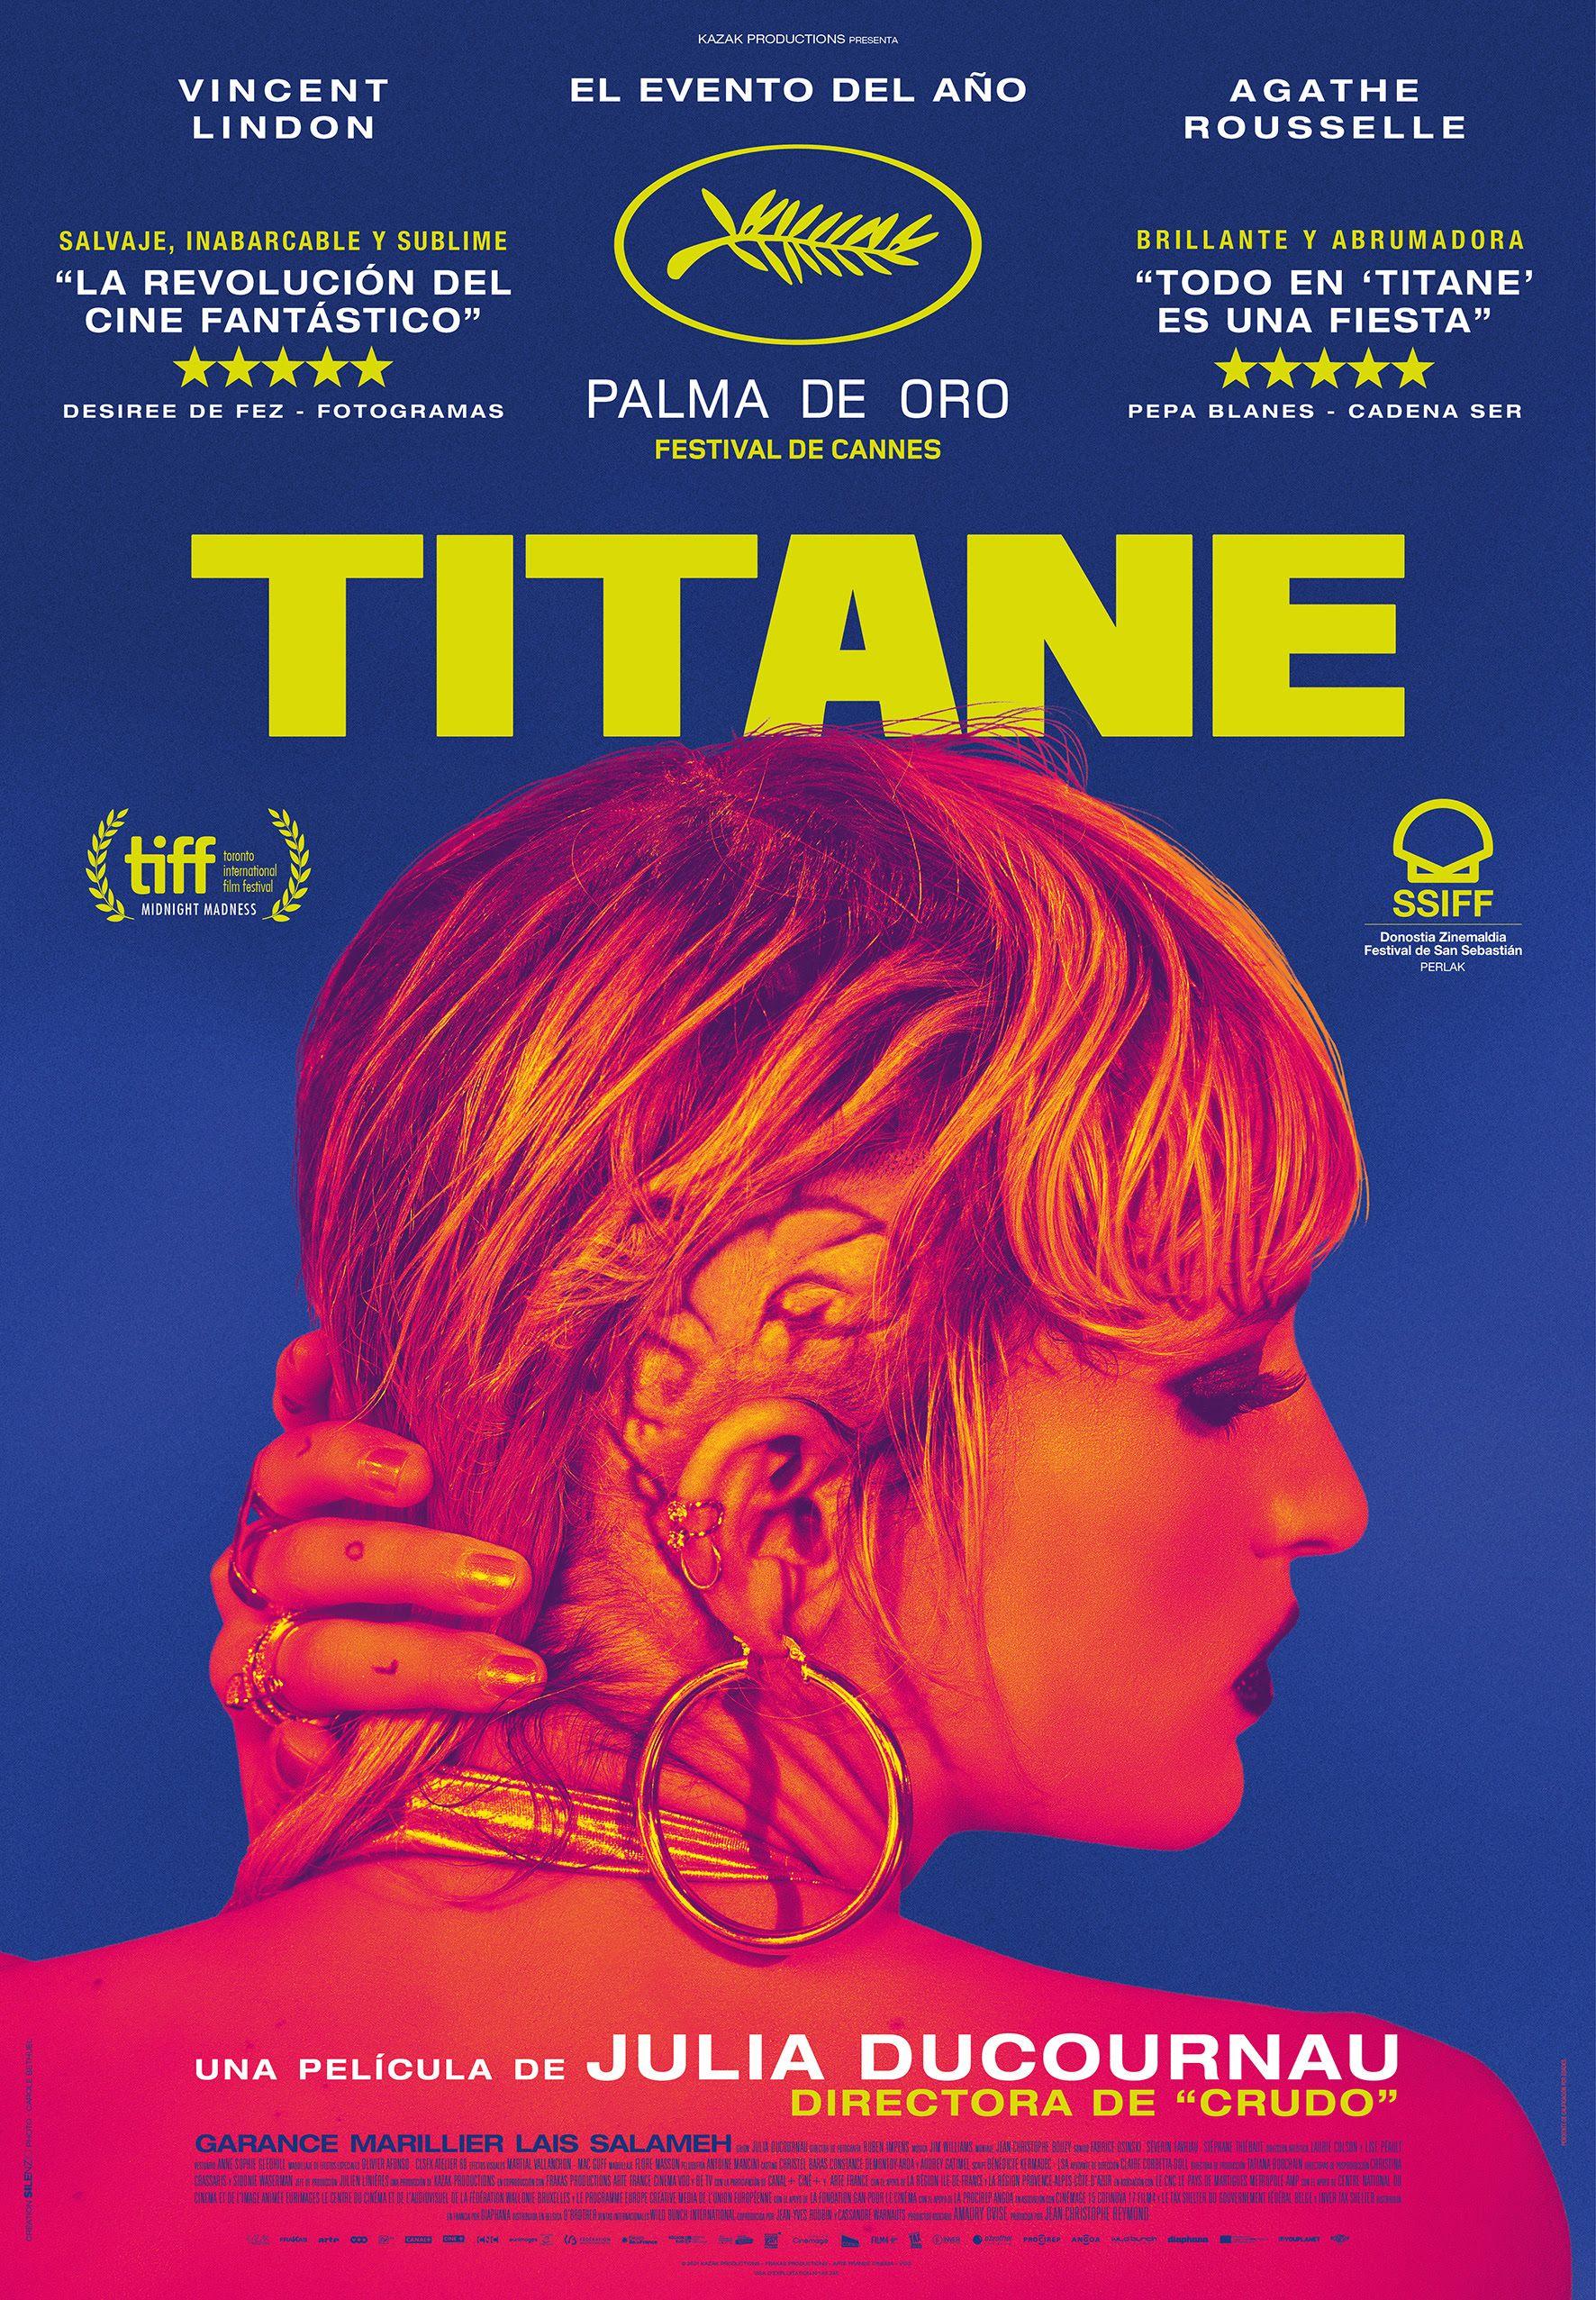 Póster español de 'TITANE' que se estrenará en España el 8 de octubre -  Aullidos.com